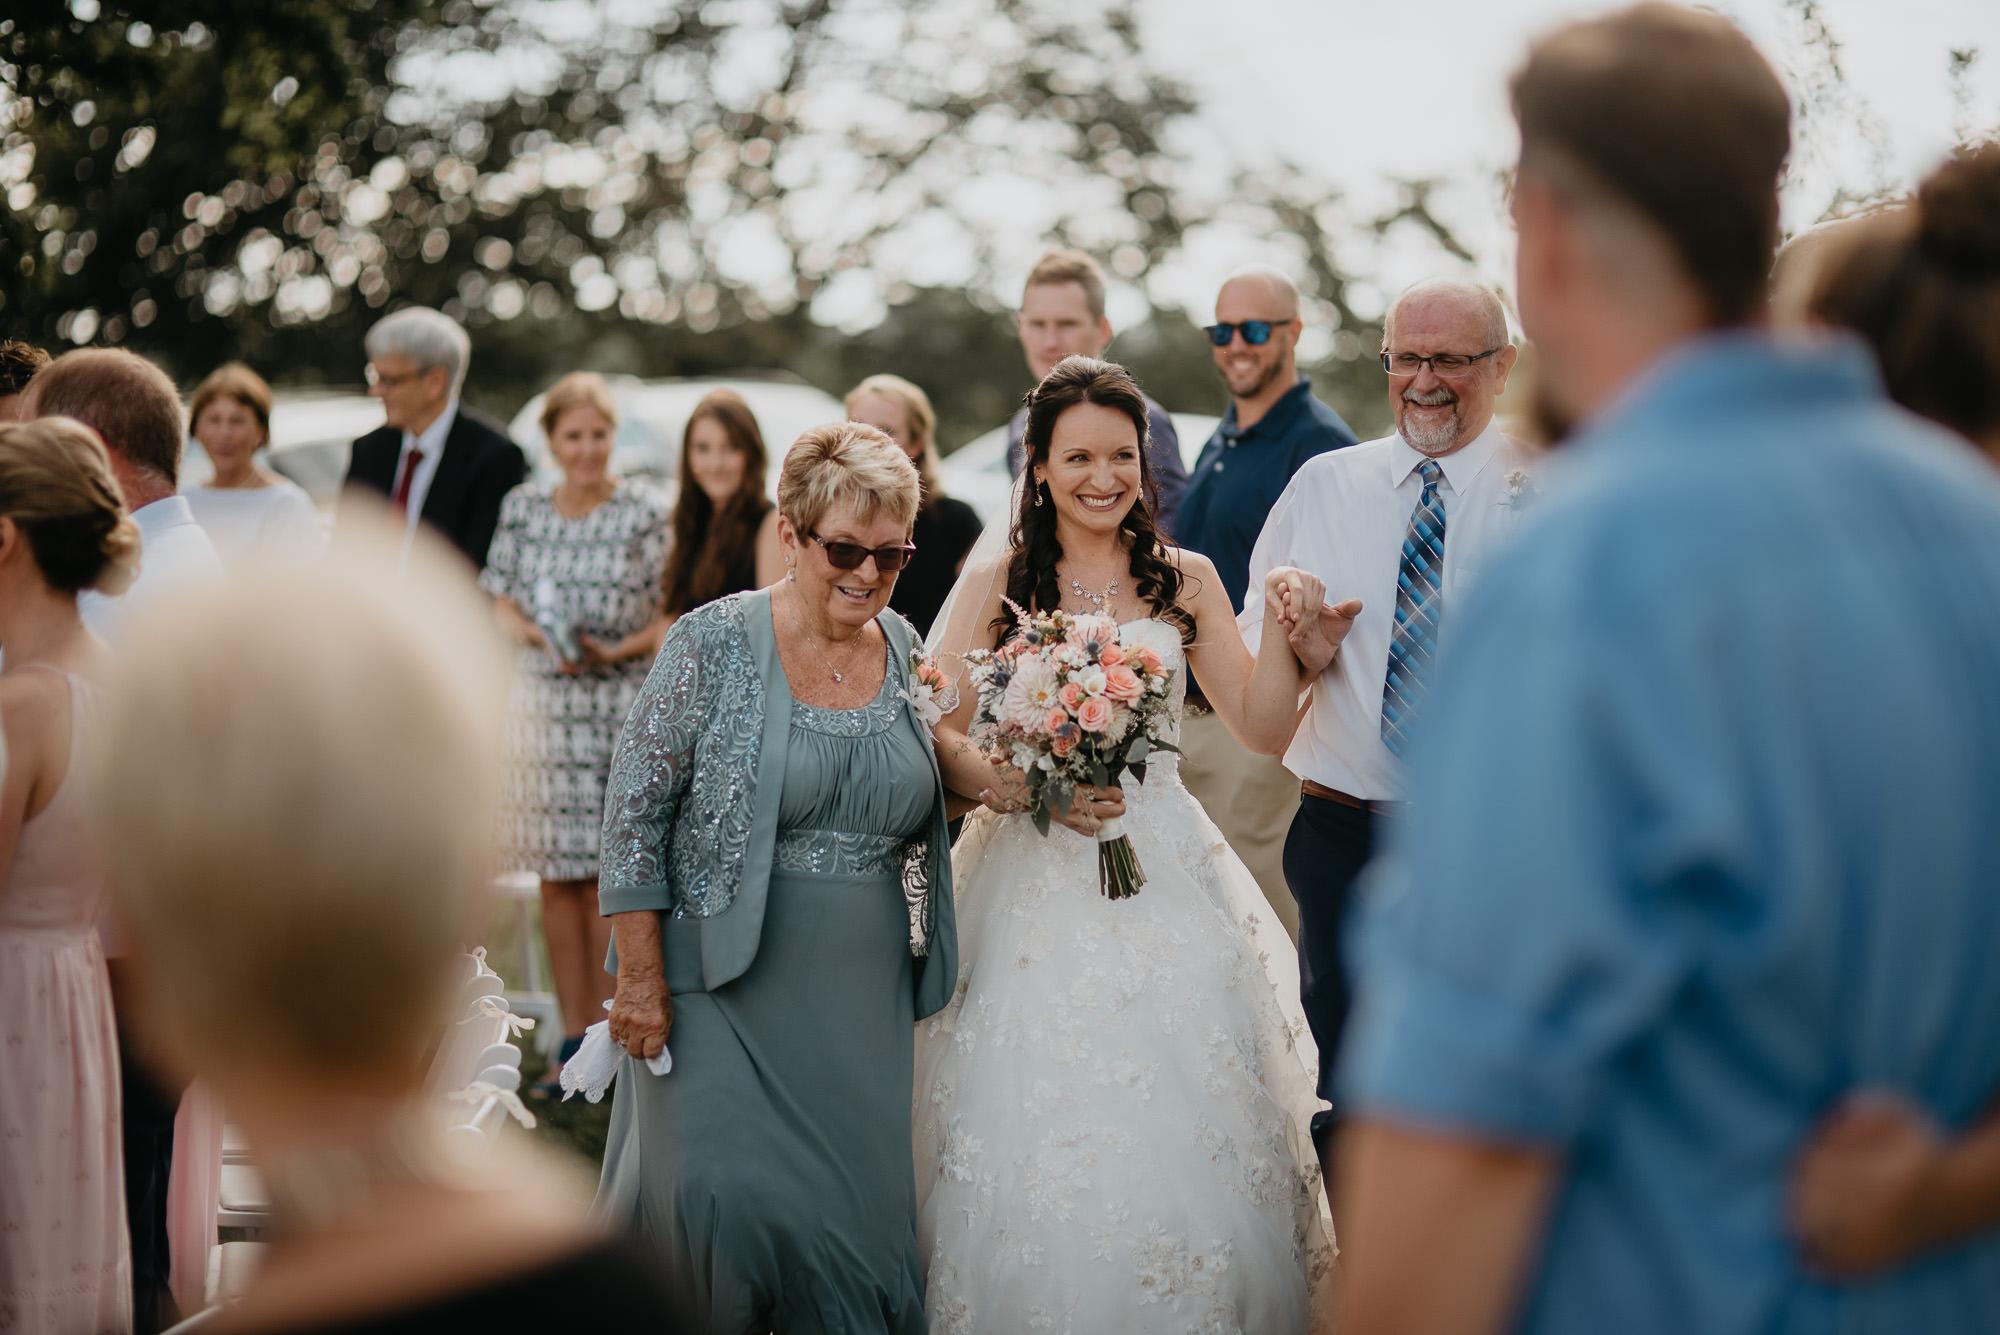 Doe Creek Farm - Weddings - Virginia - Best Wedding Photographer - Pat Cori Photography-28.jpg